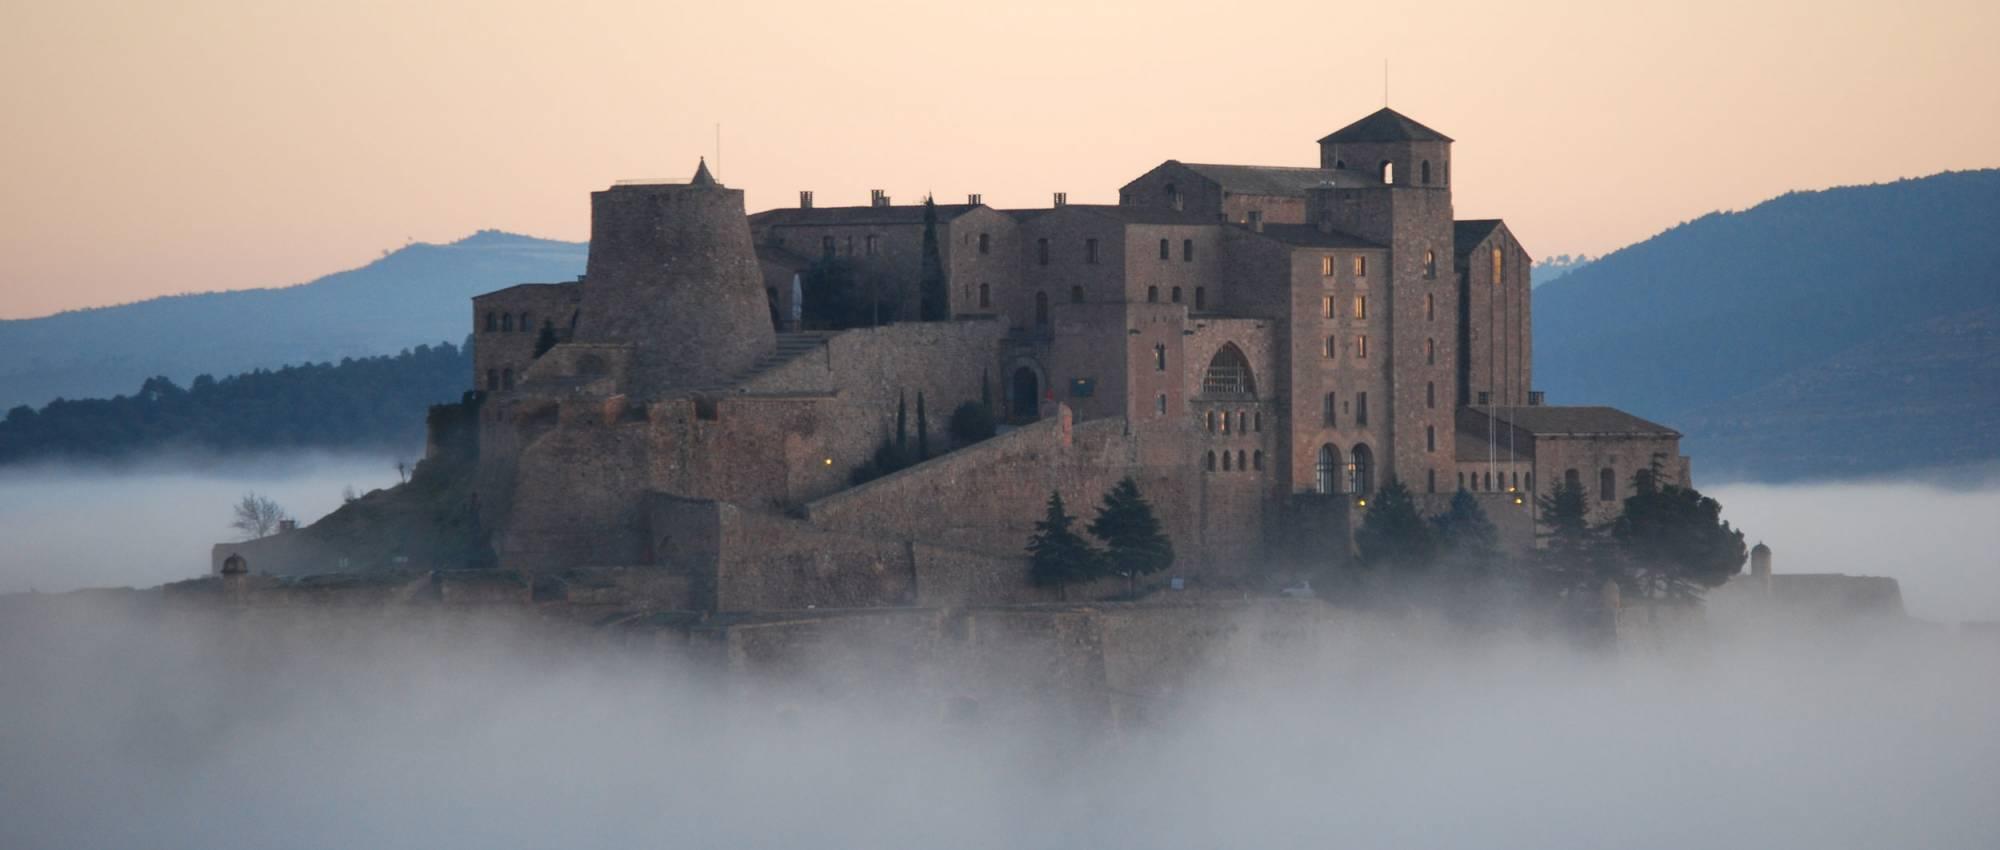 El castell de Cardona © Domènec Nogués